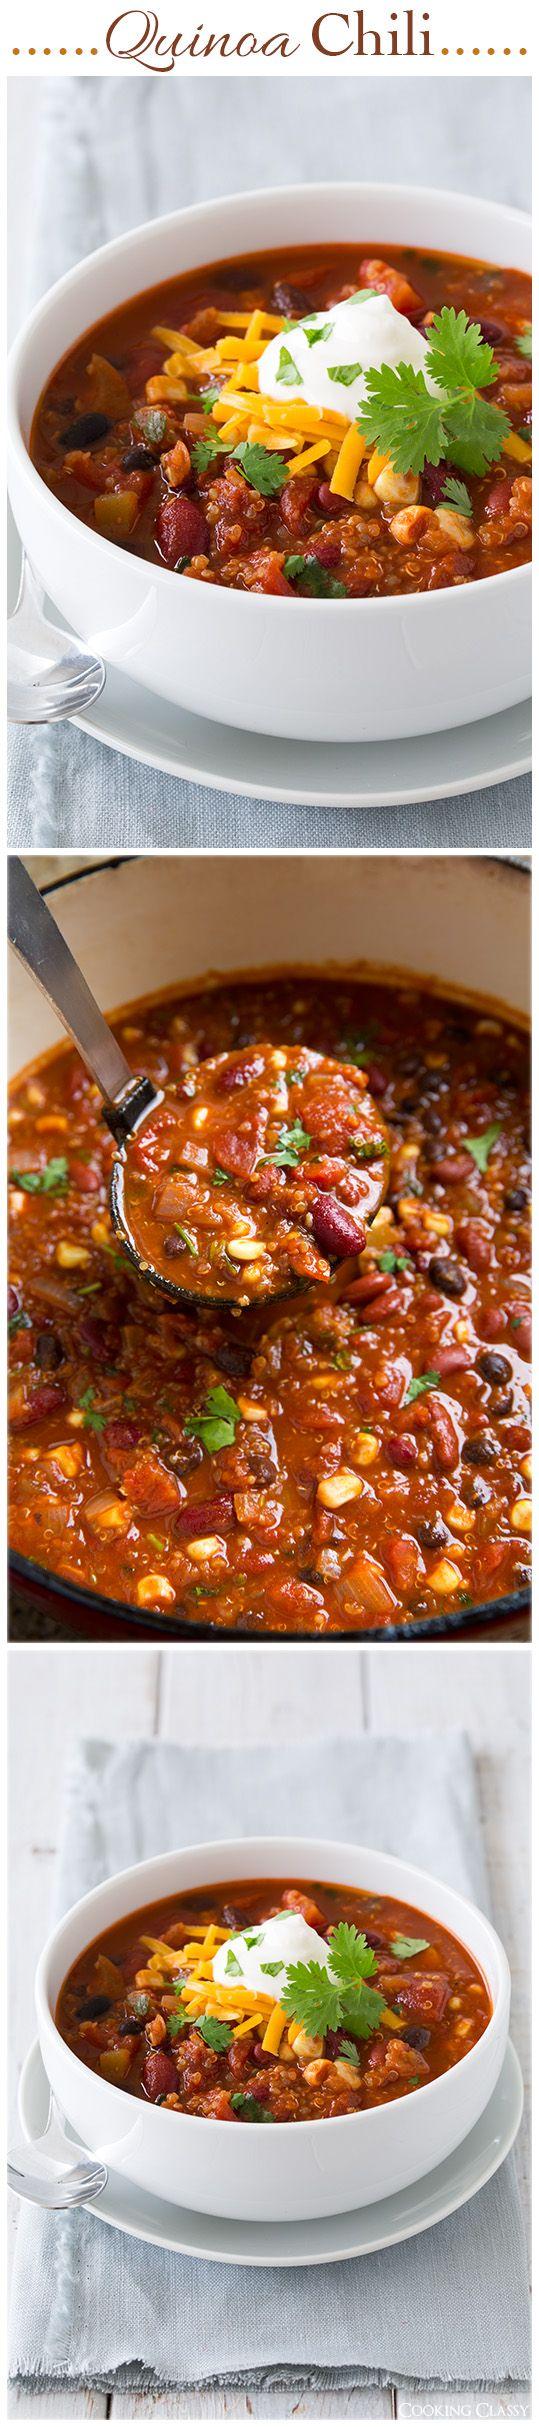 Quinoa Chili | Recipe | Why vegan, Love this and Popular ...